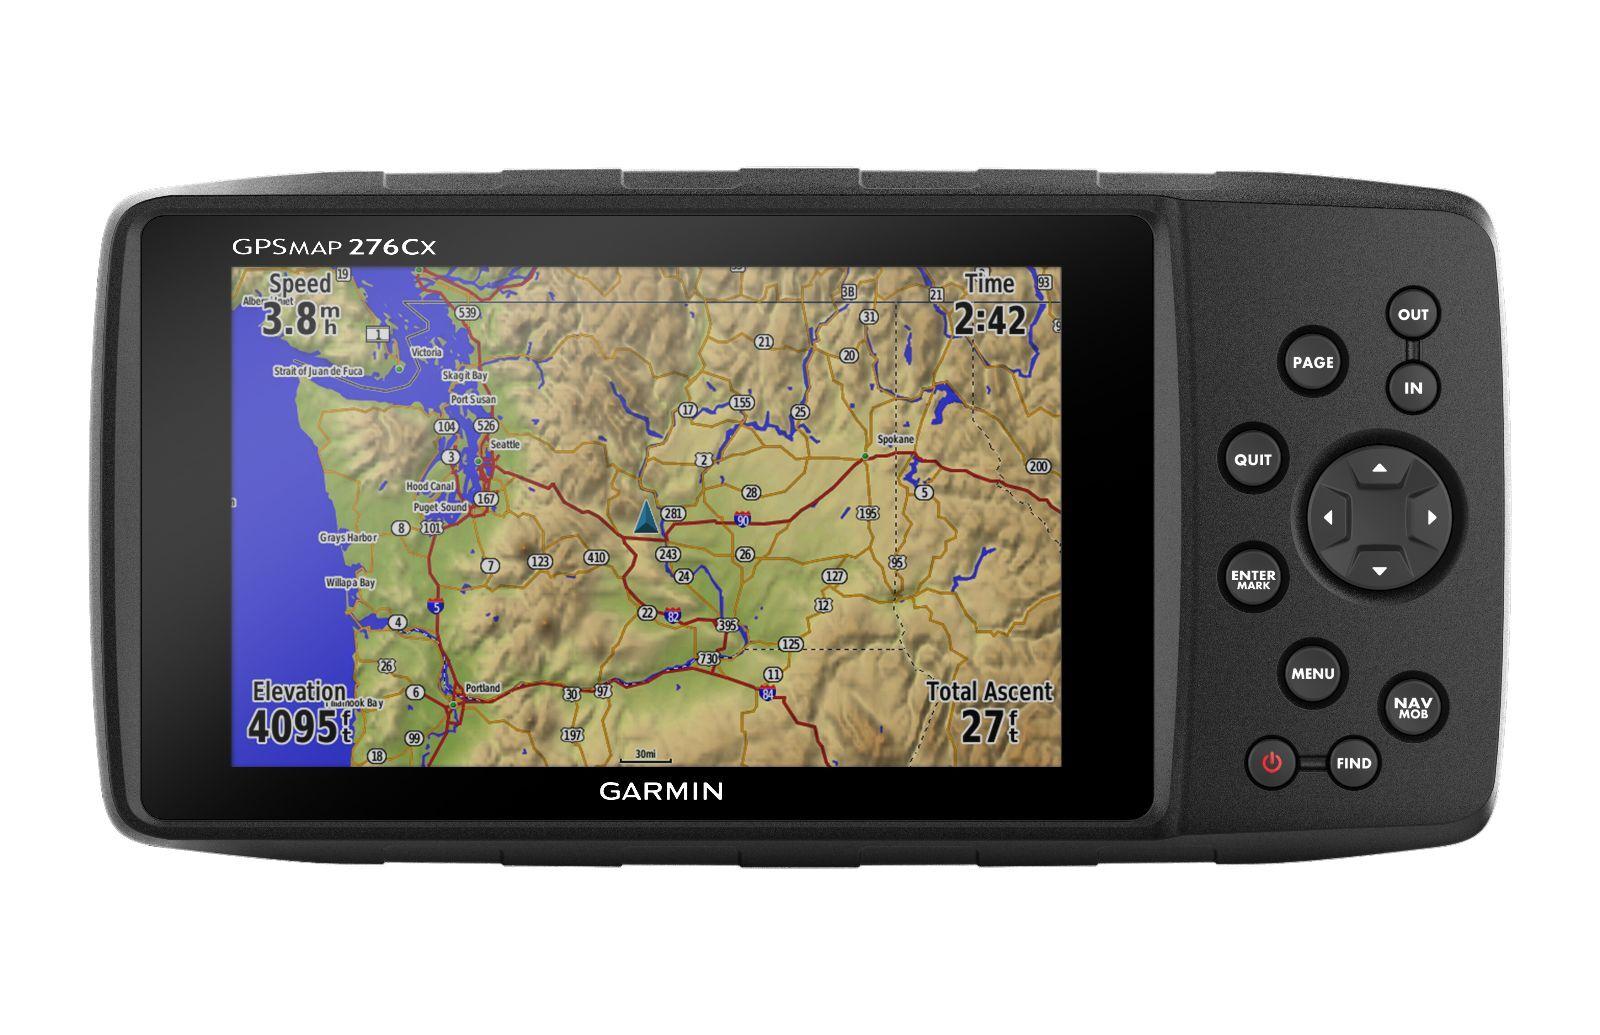 Garmin GPSMAP 276Cx All-terrain  GPS Navigator Advanced Mapping 010-01607-00  discount